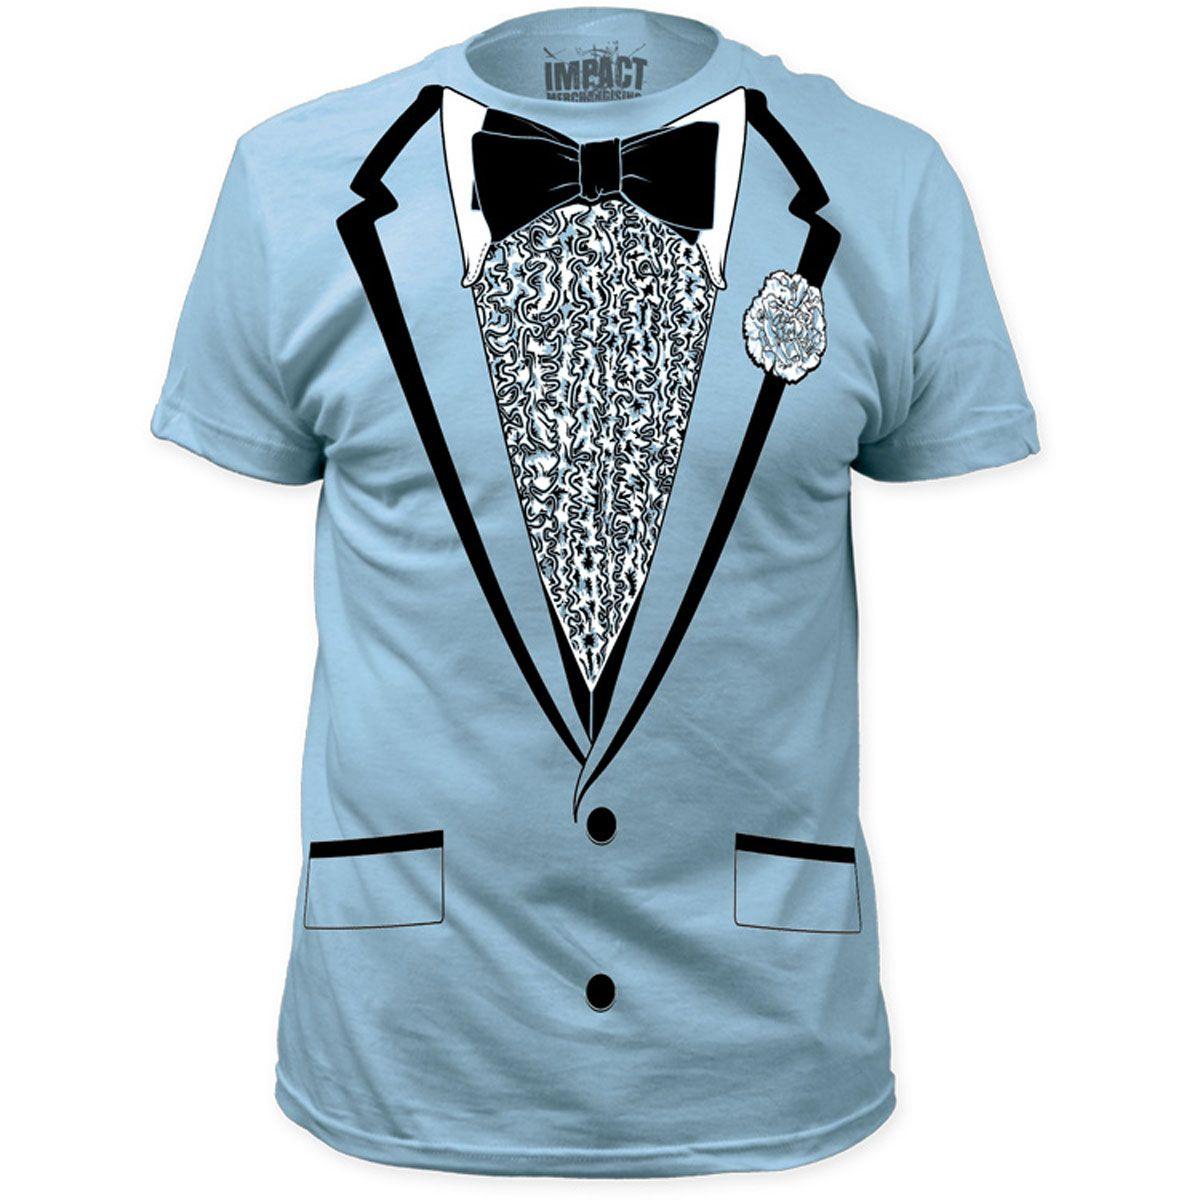 tuxedo t shirt melbourne